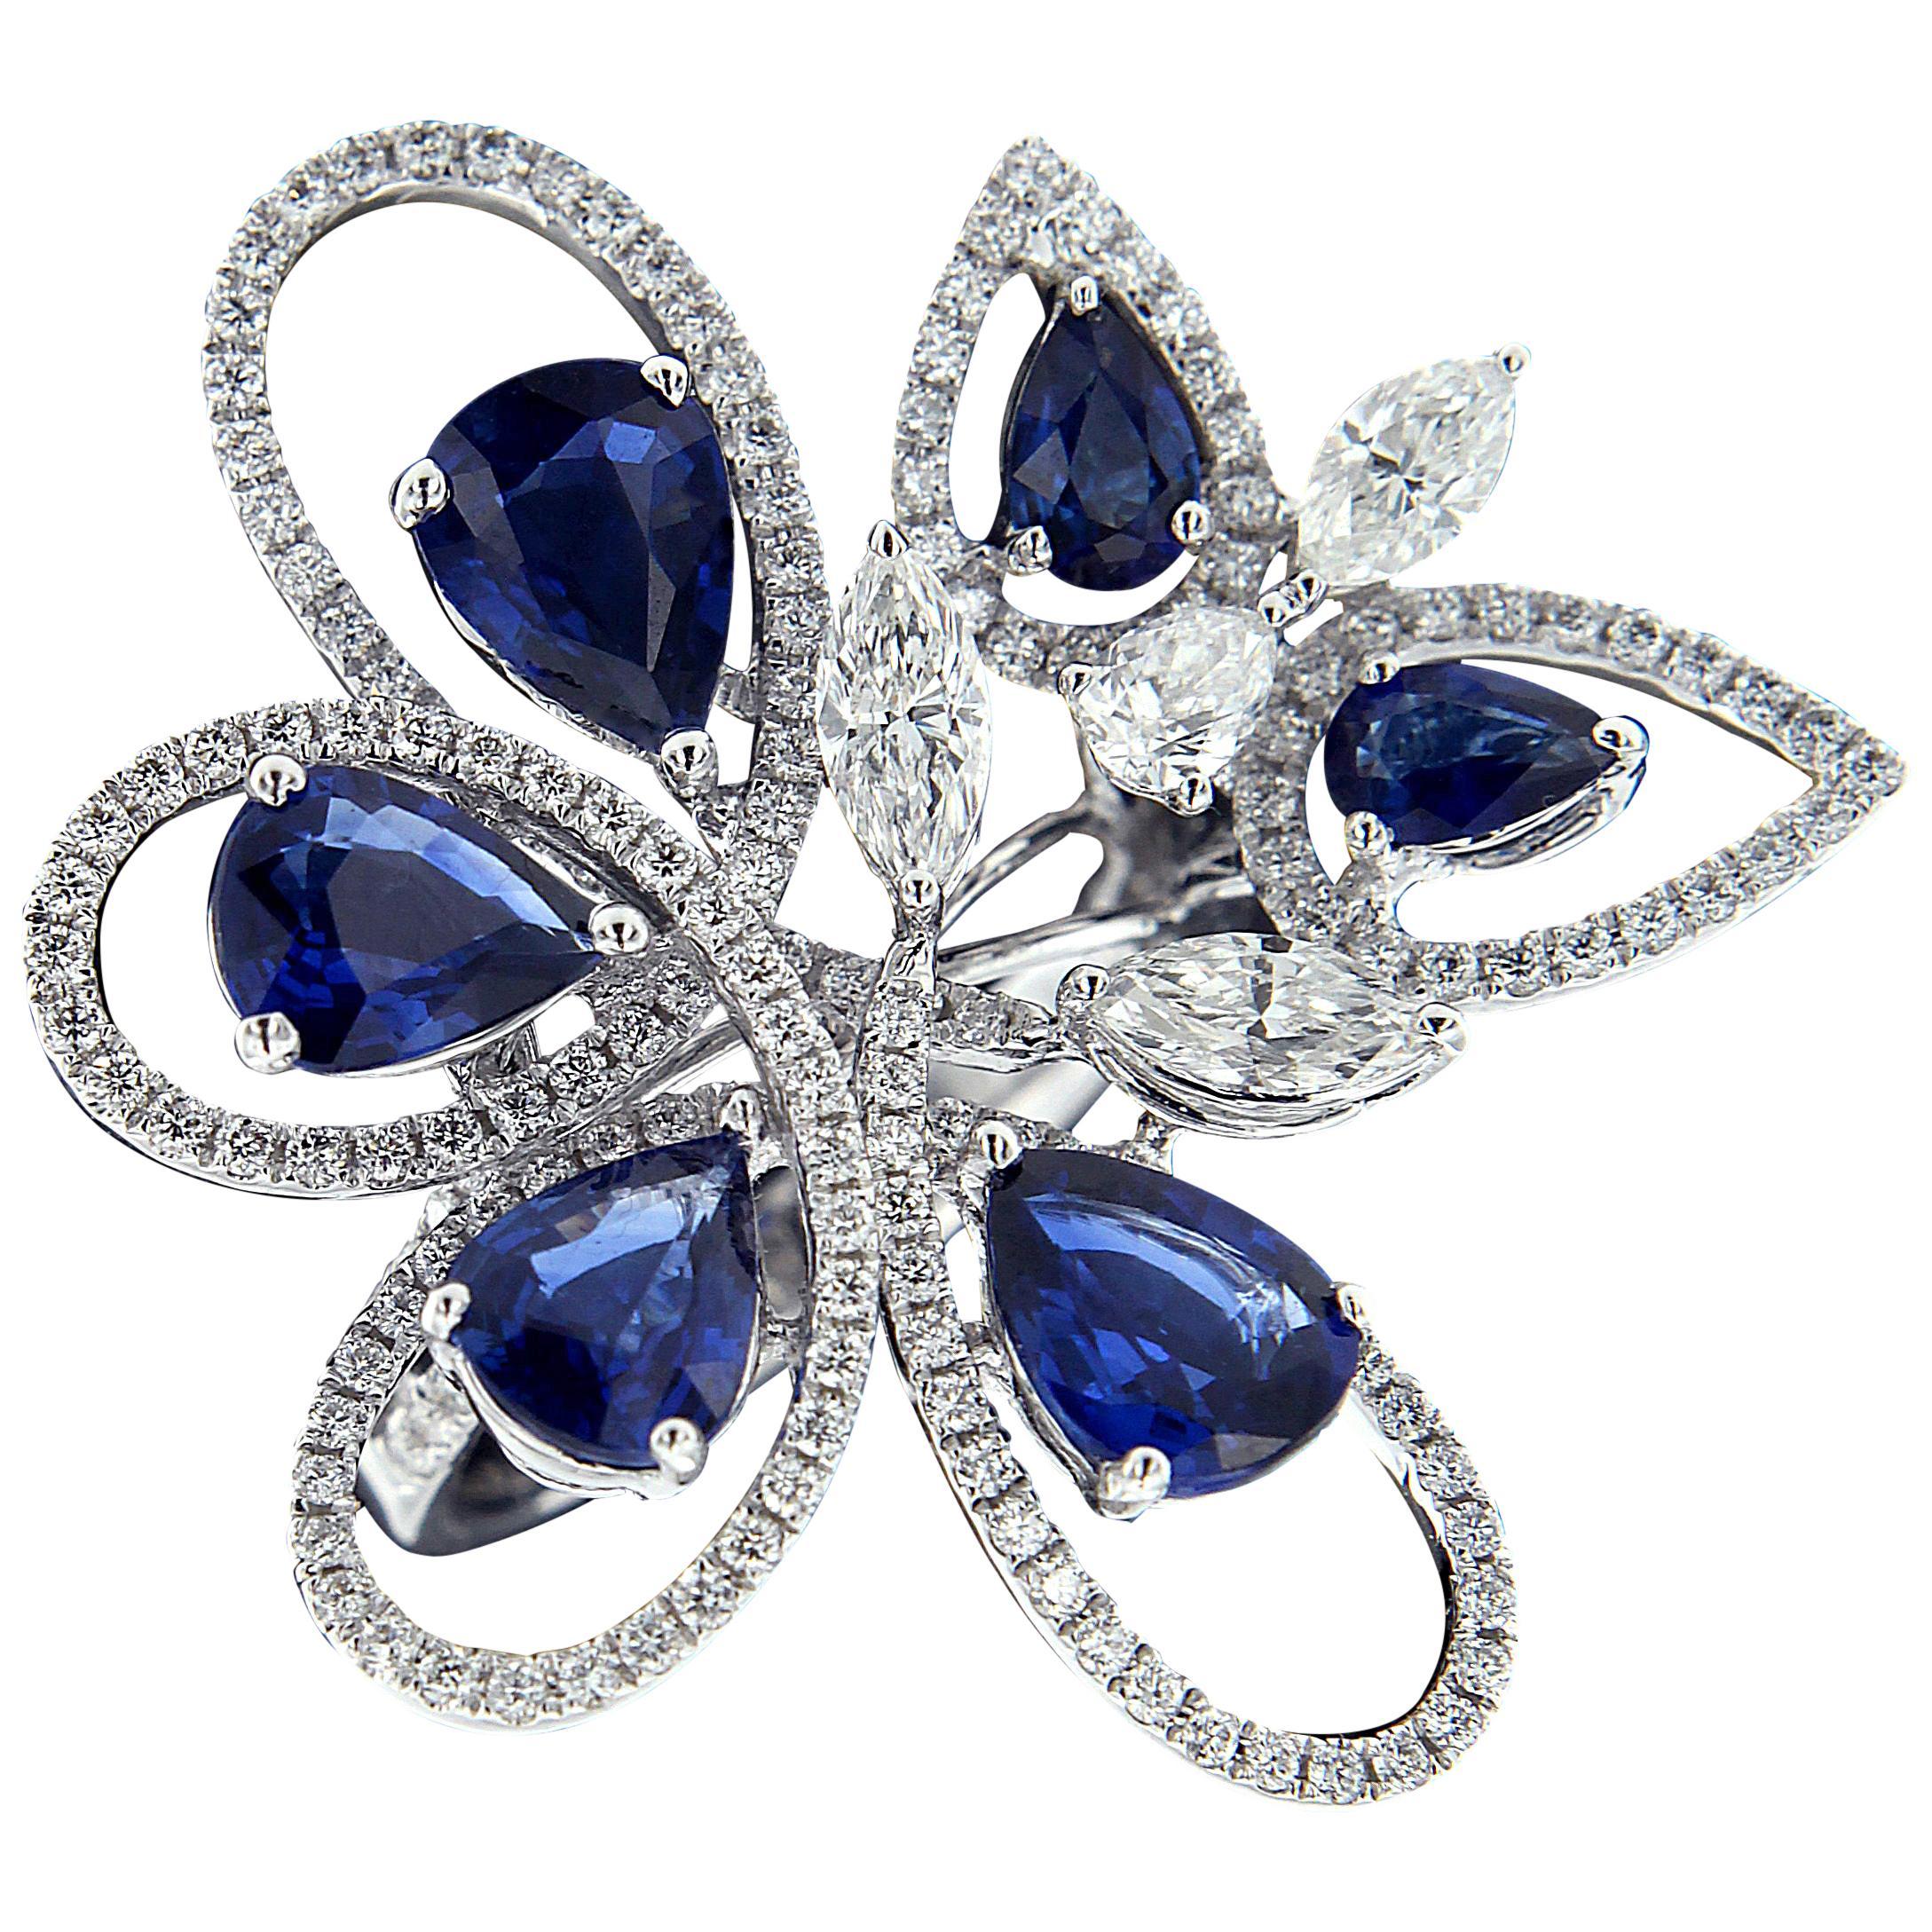 Charming 18 Karat White Gold, Diamond and Sapphire Rings